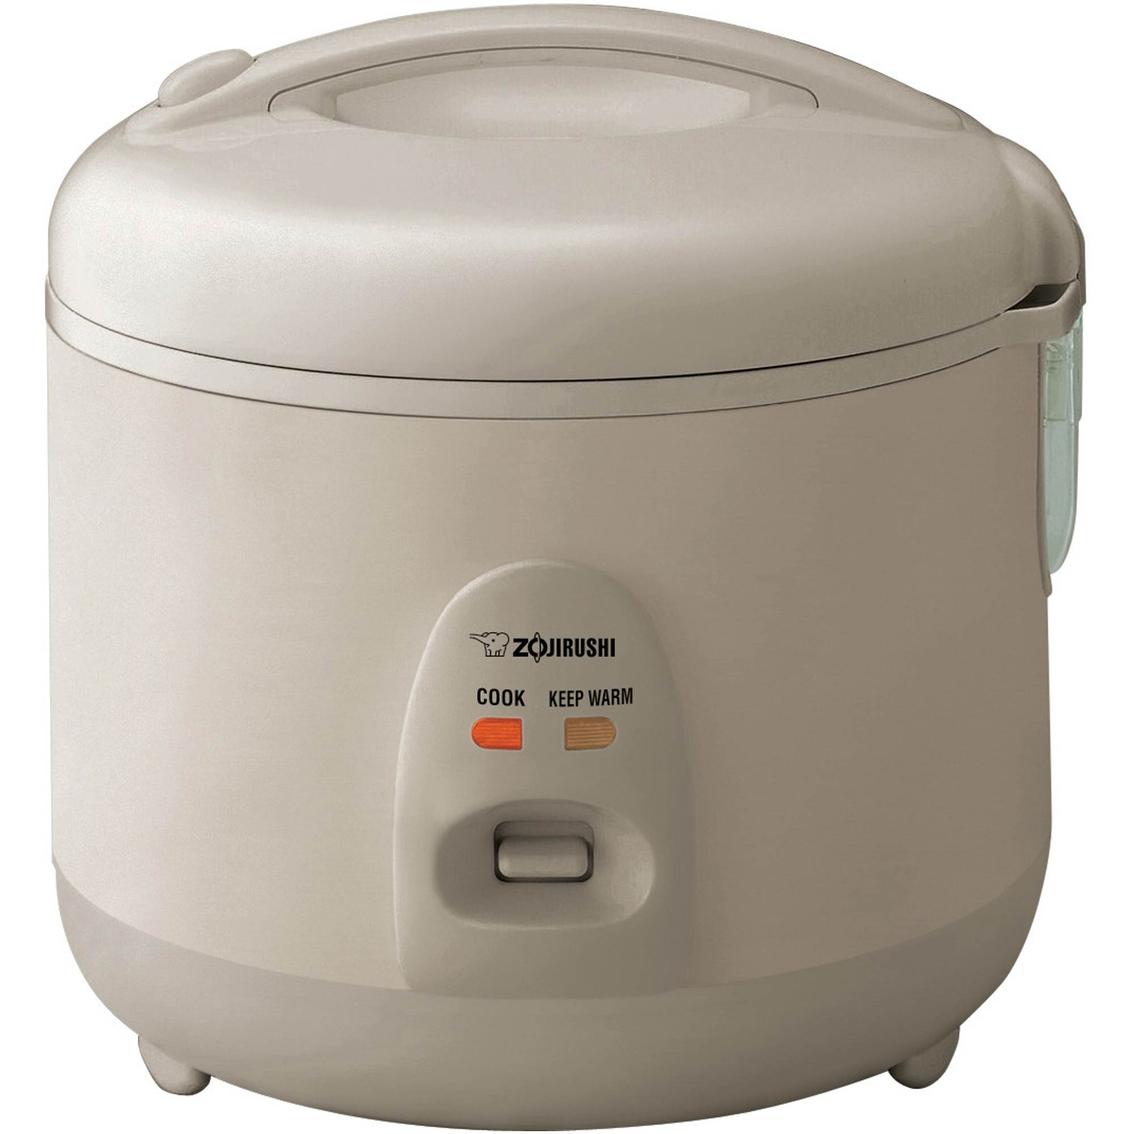 Zojirushi 10 Cup Automatic Rice Cooker & Warmer | Rice